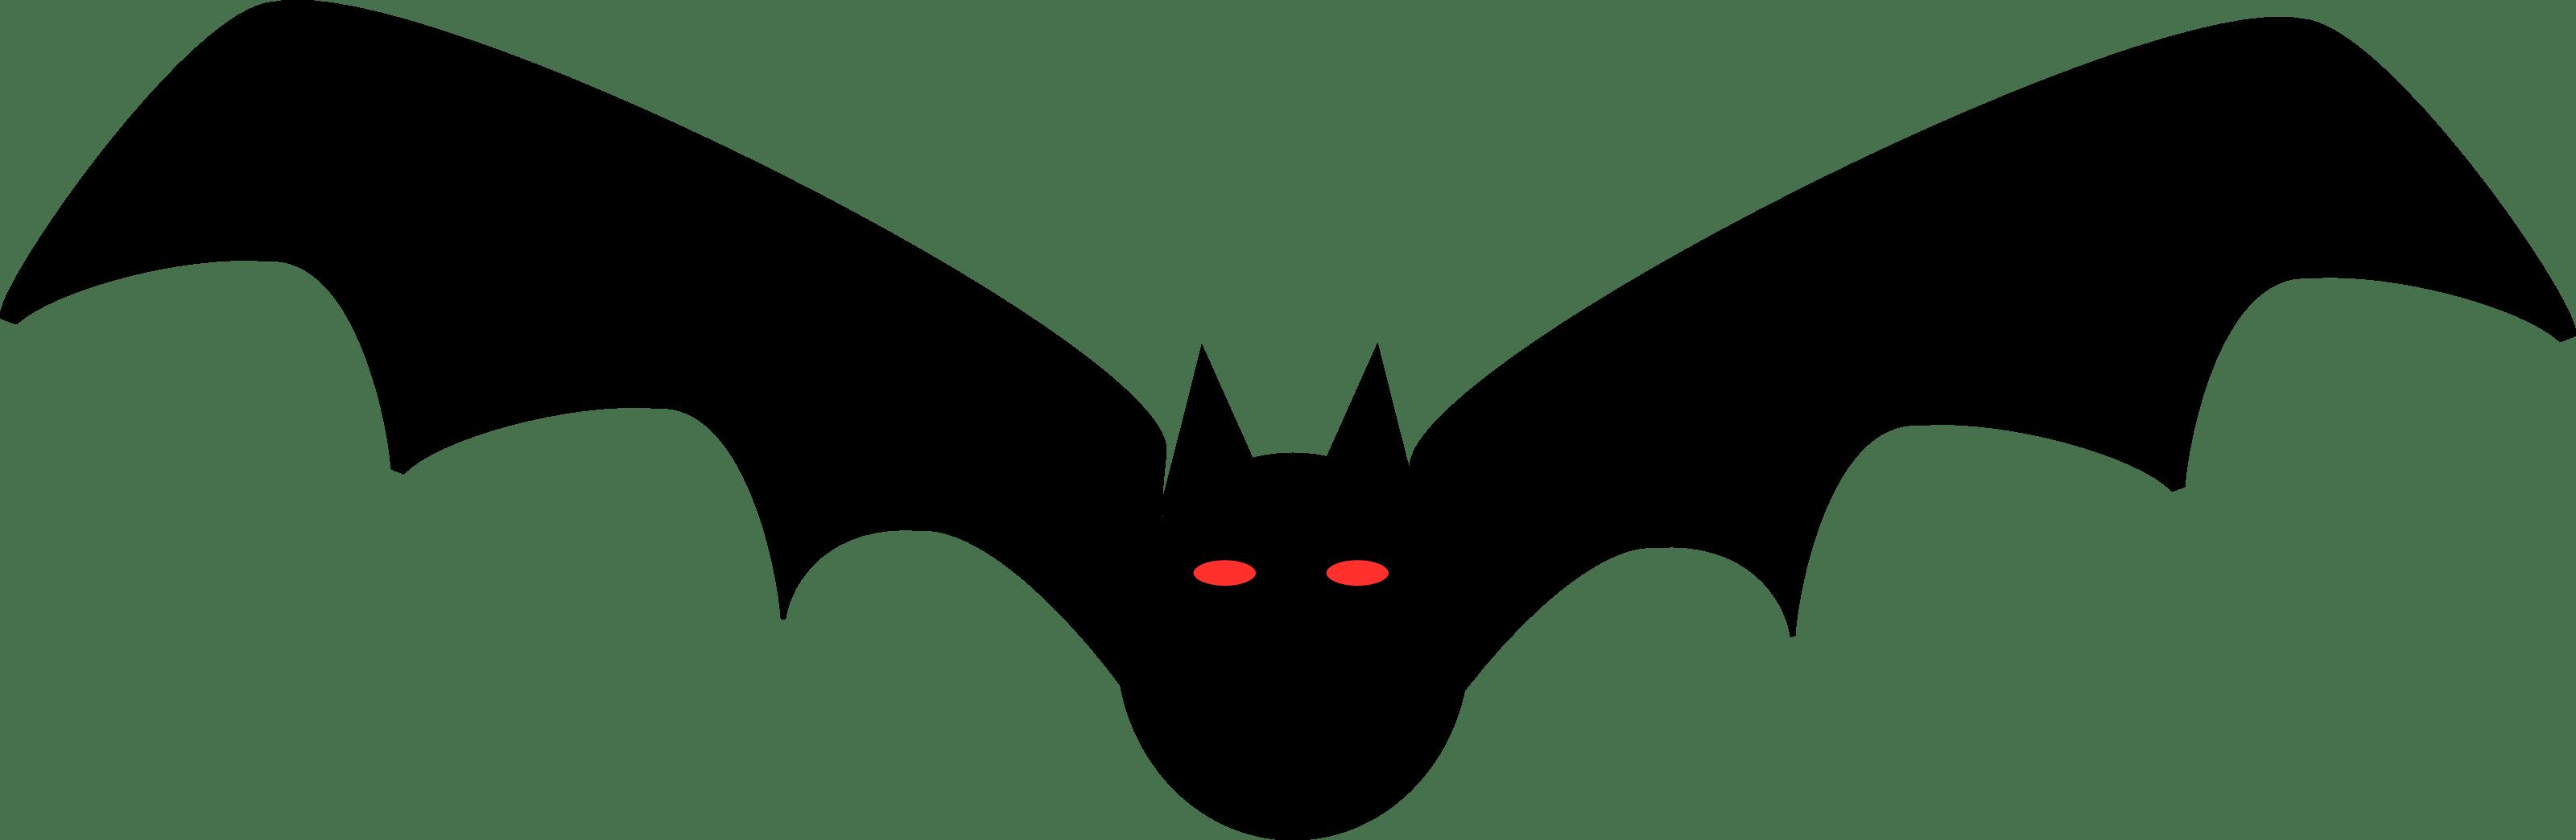 Halloween Clip Art 2018 Dr Odd